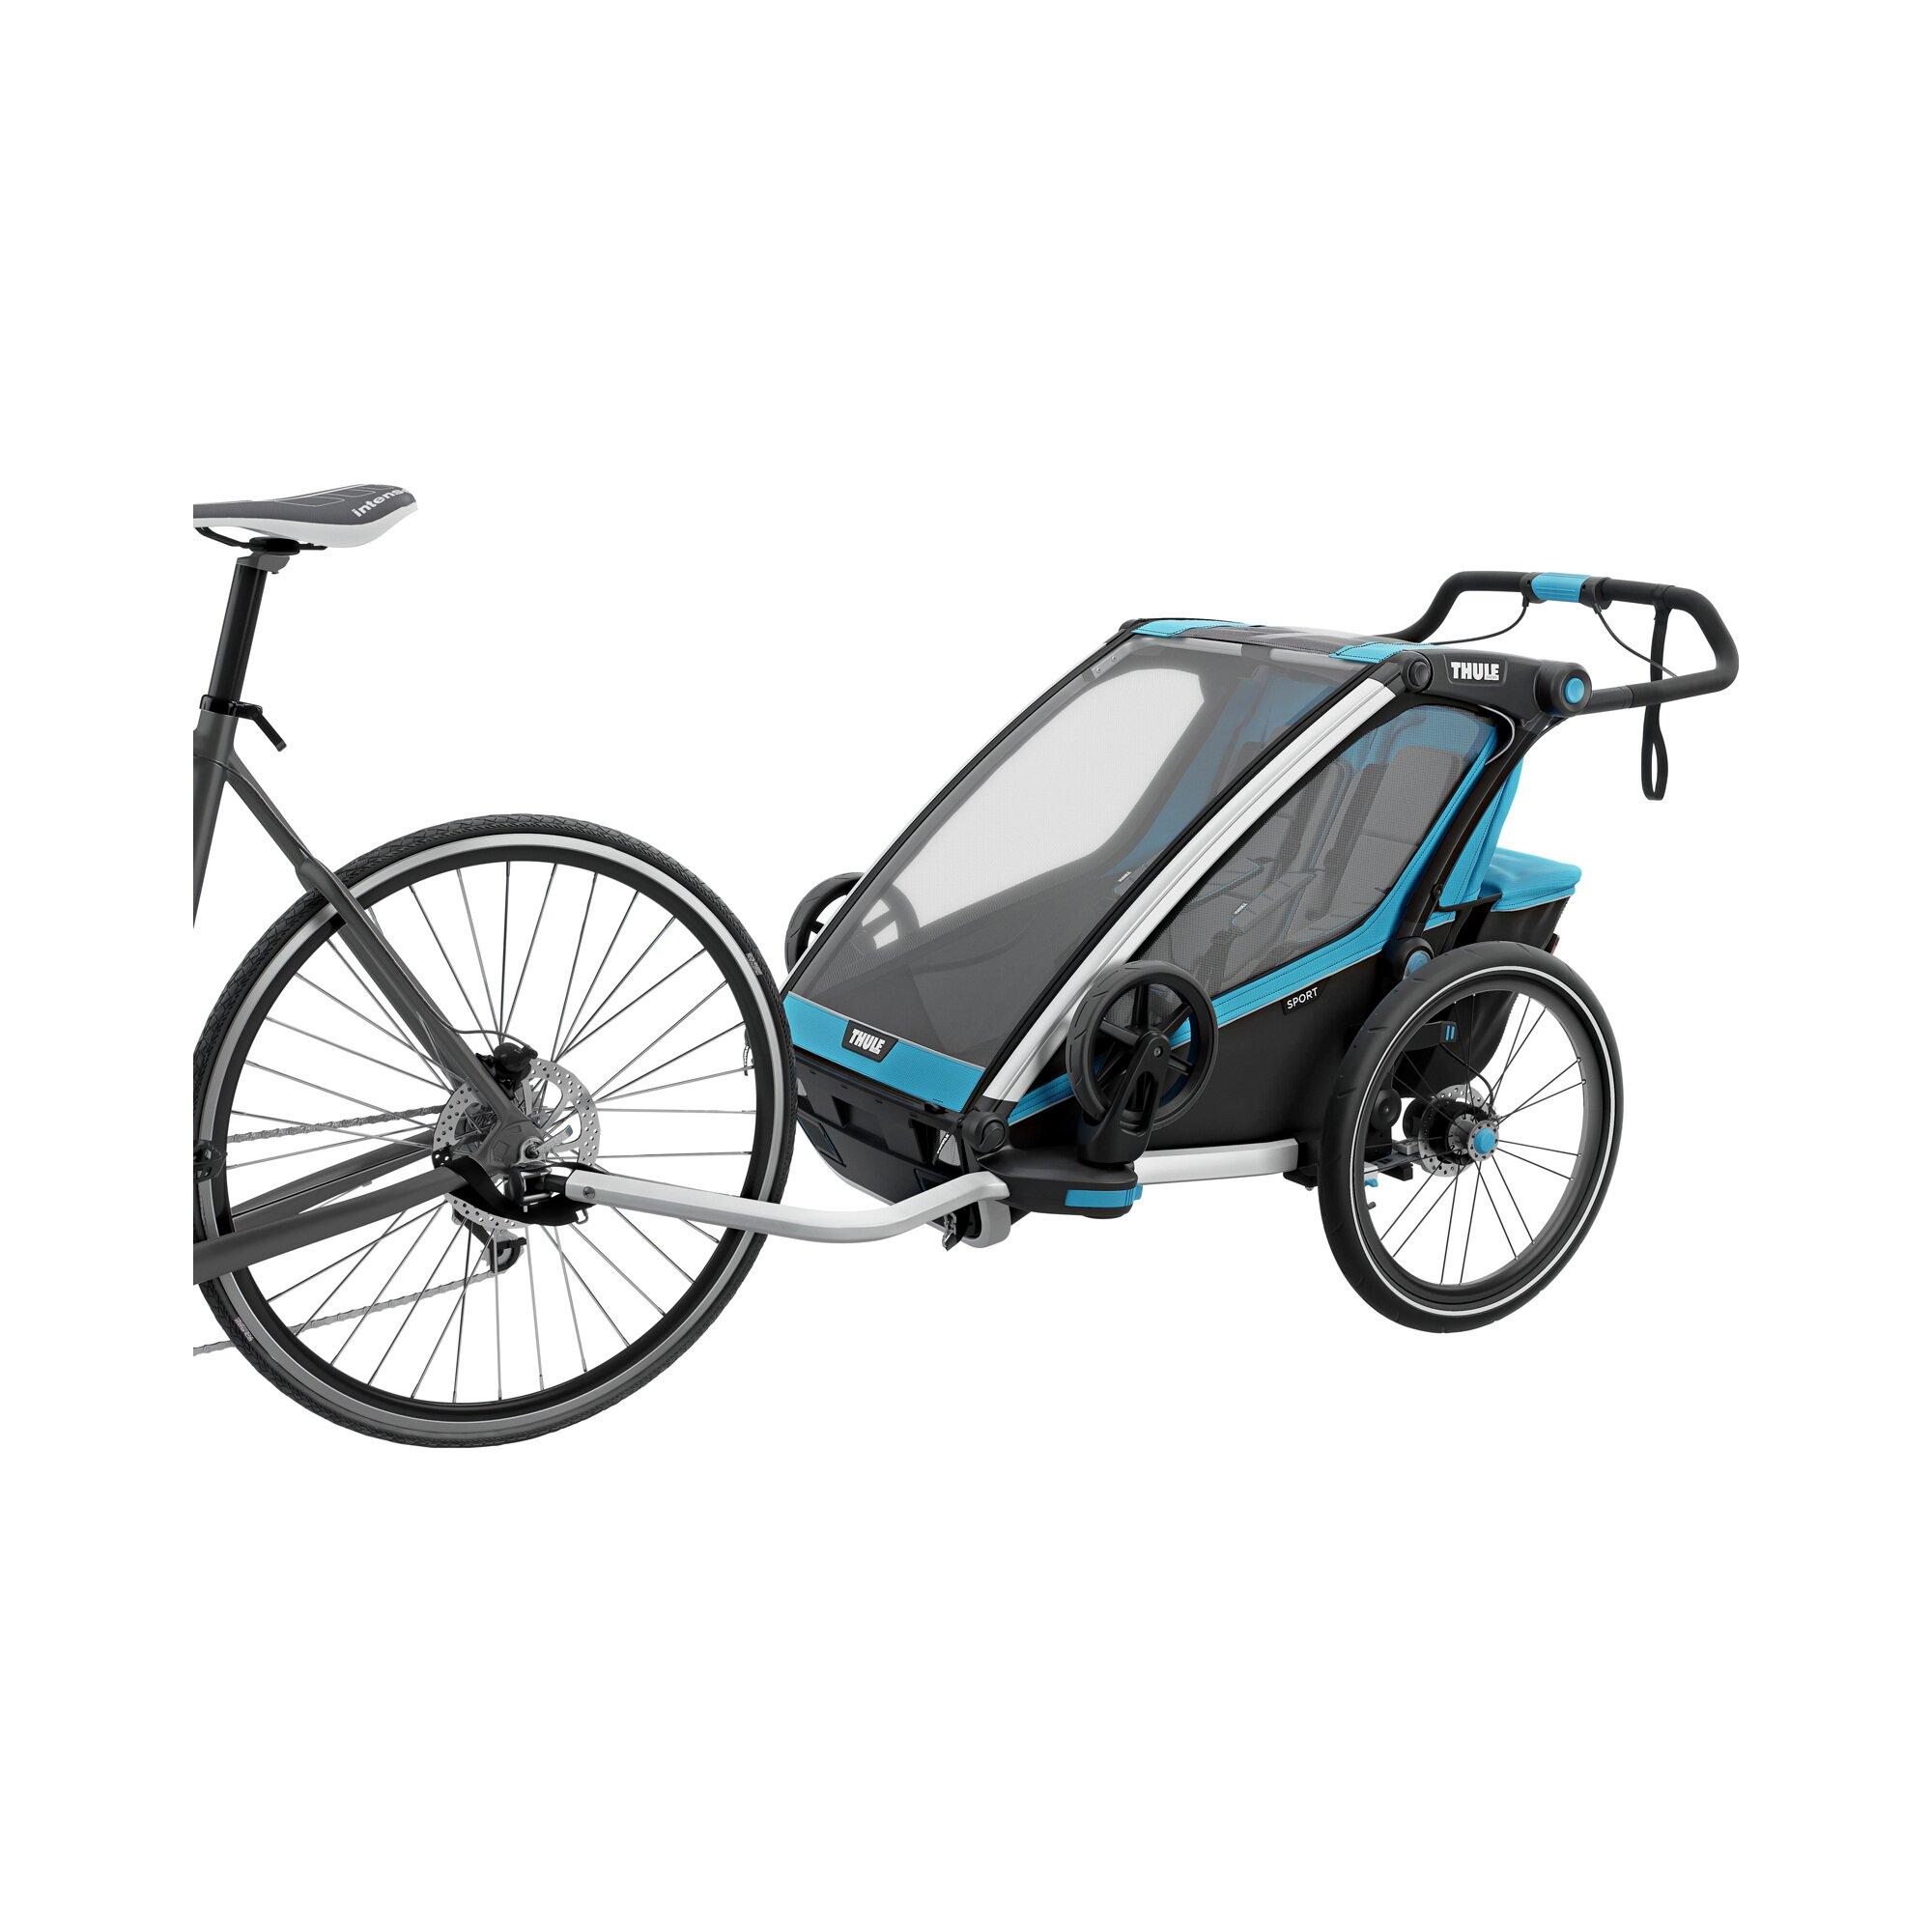 thule-chariot-sport2-fahrradanhanger